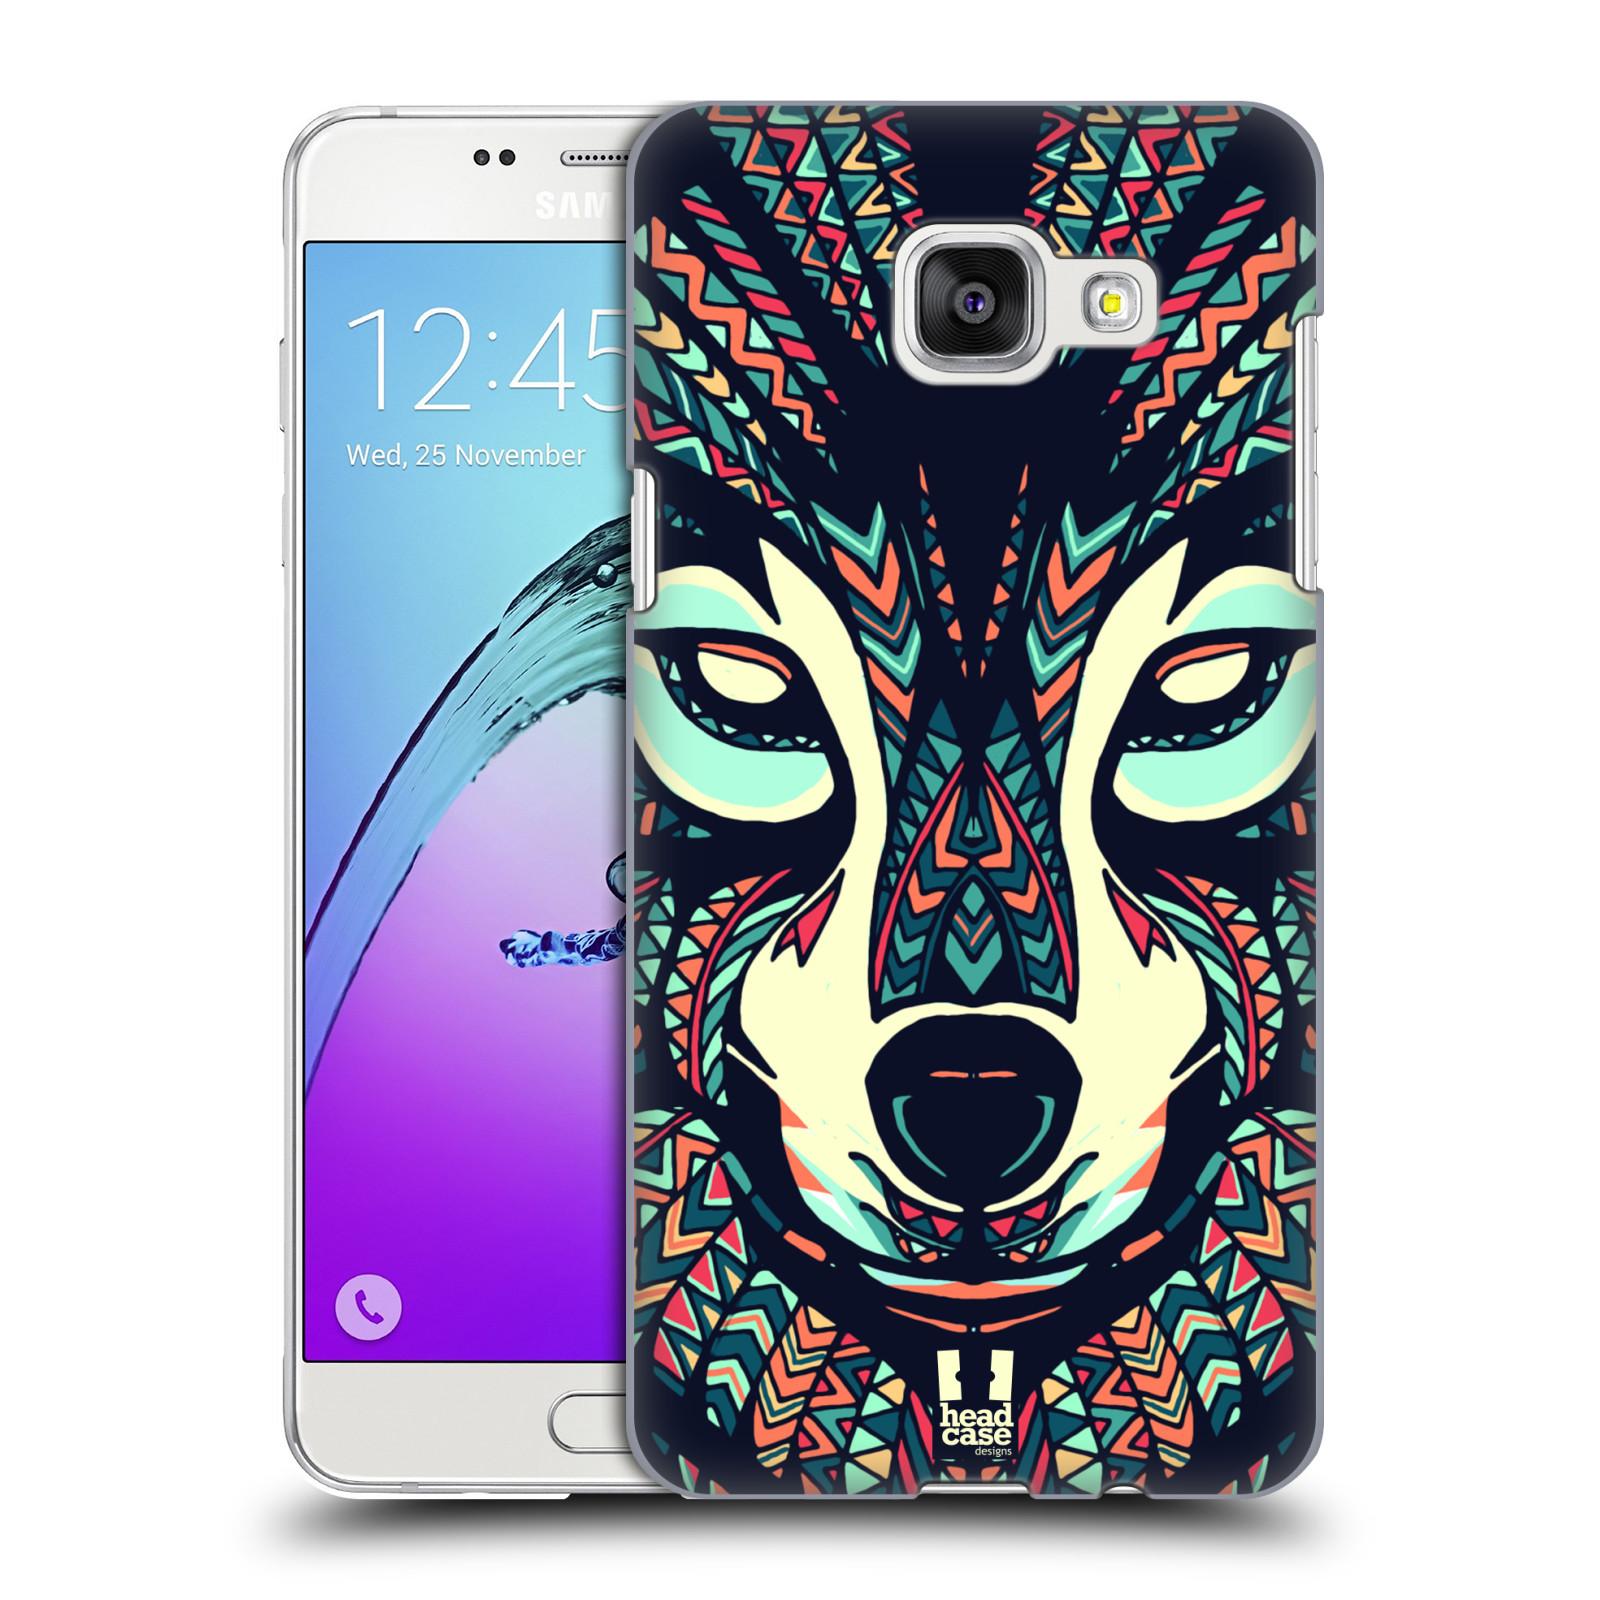 Plastové pouzdro na mobil Samsung Galaxy A5 (2016) HEAD CASE AZTEC VLK